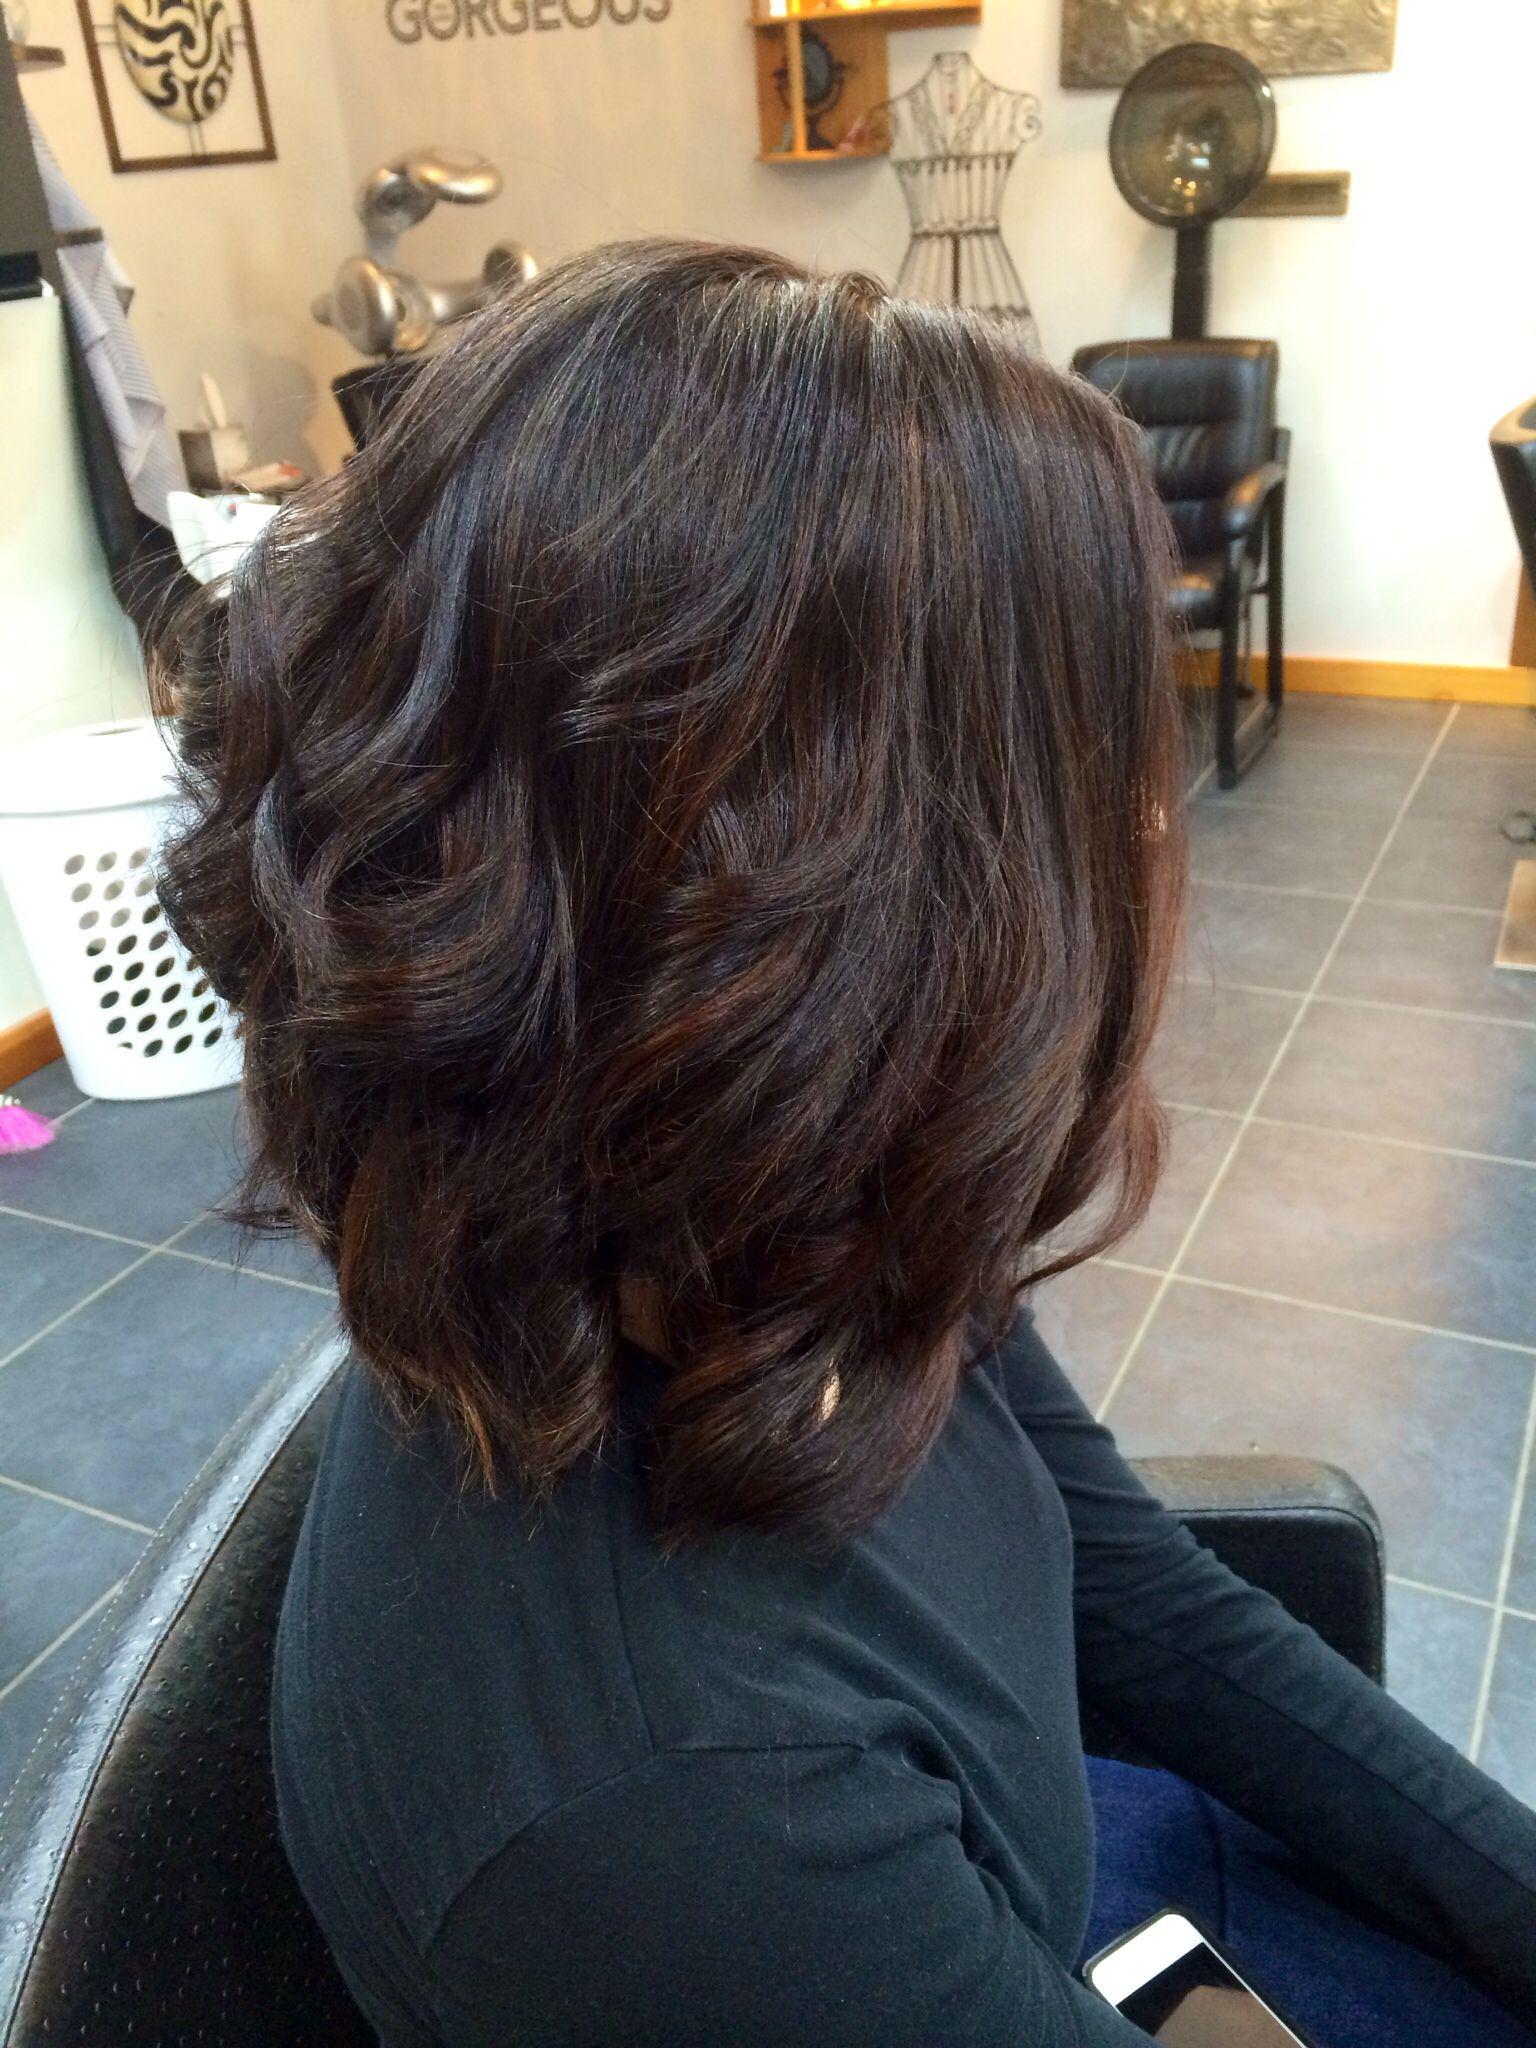 Pin By Eleni Kotretsos On Hair Indian Hairstyles Short Hair Balayage Hair Styles